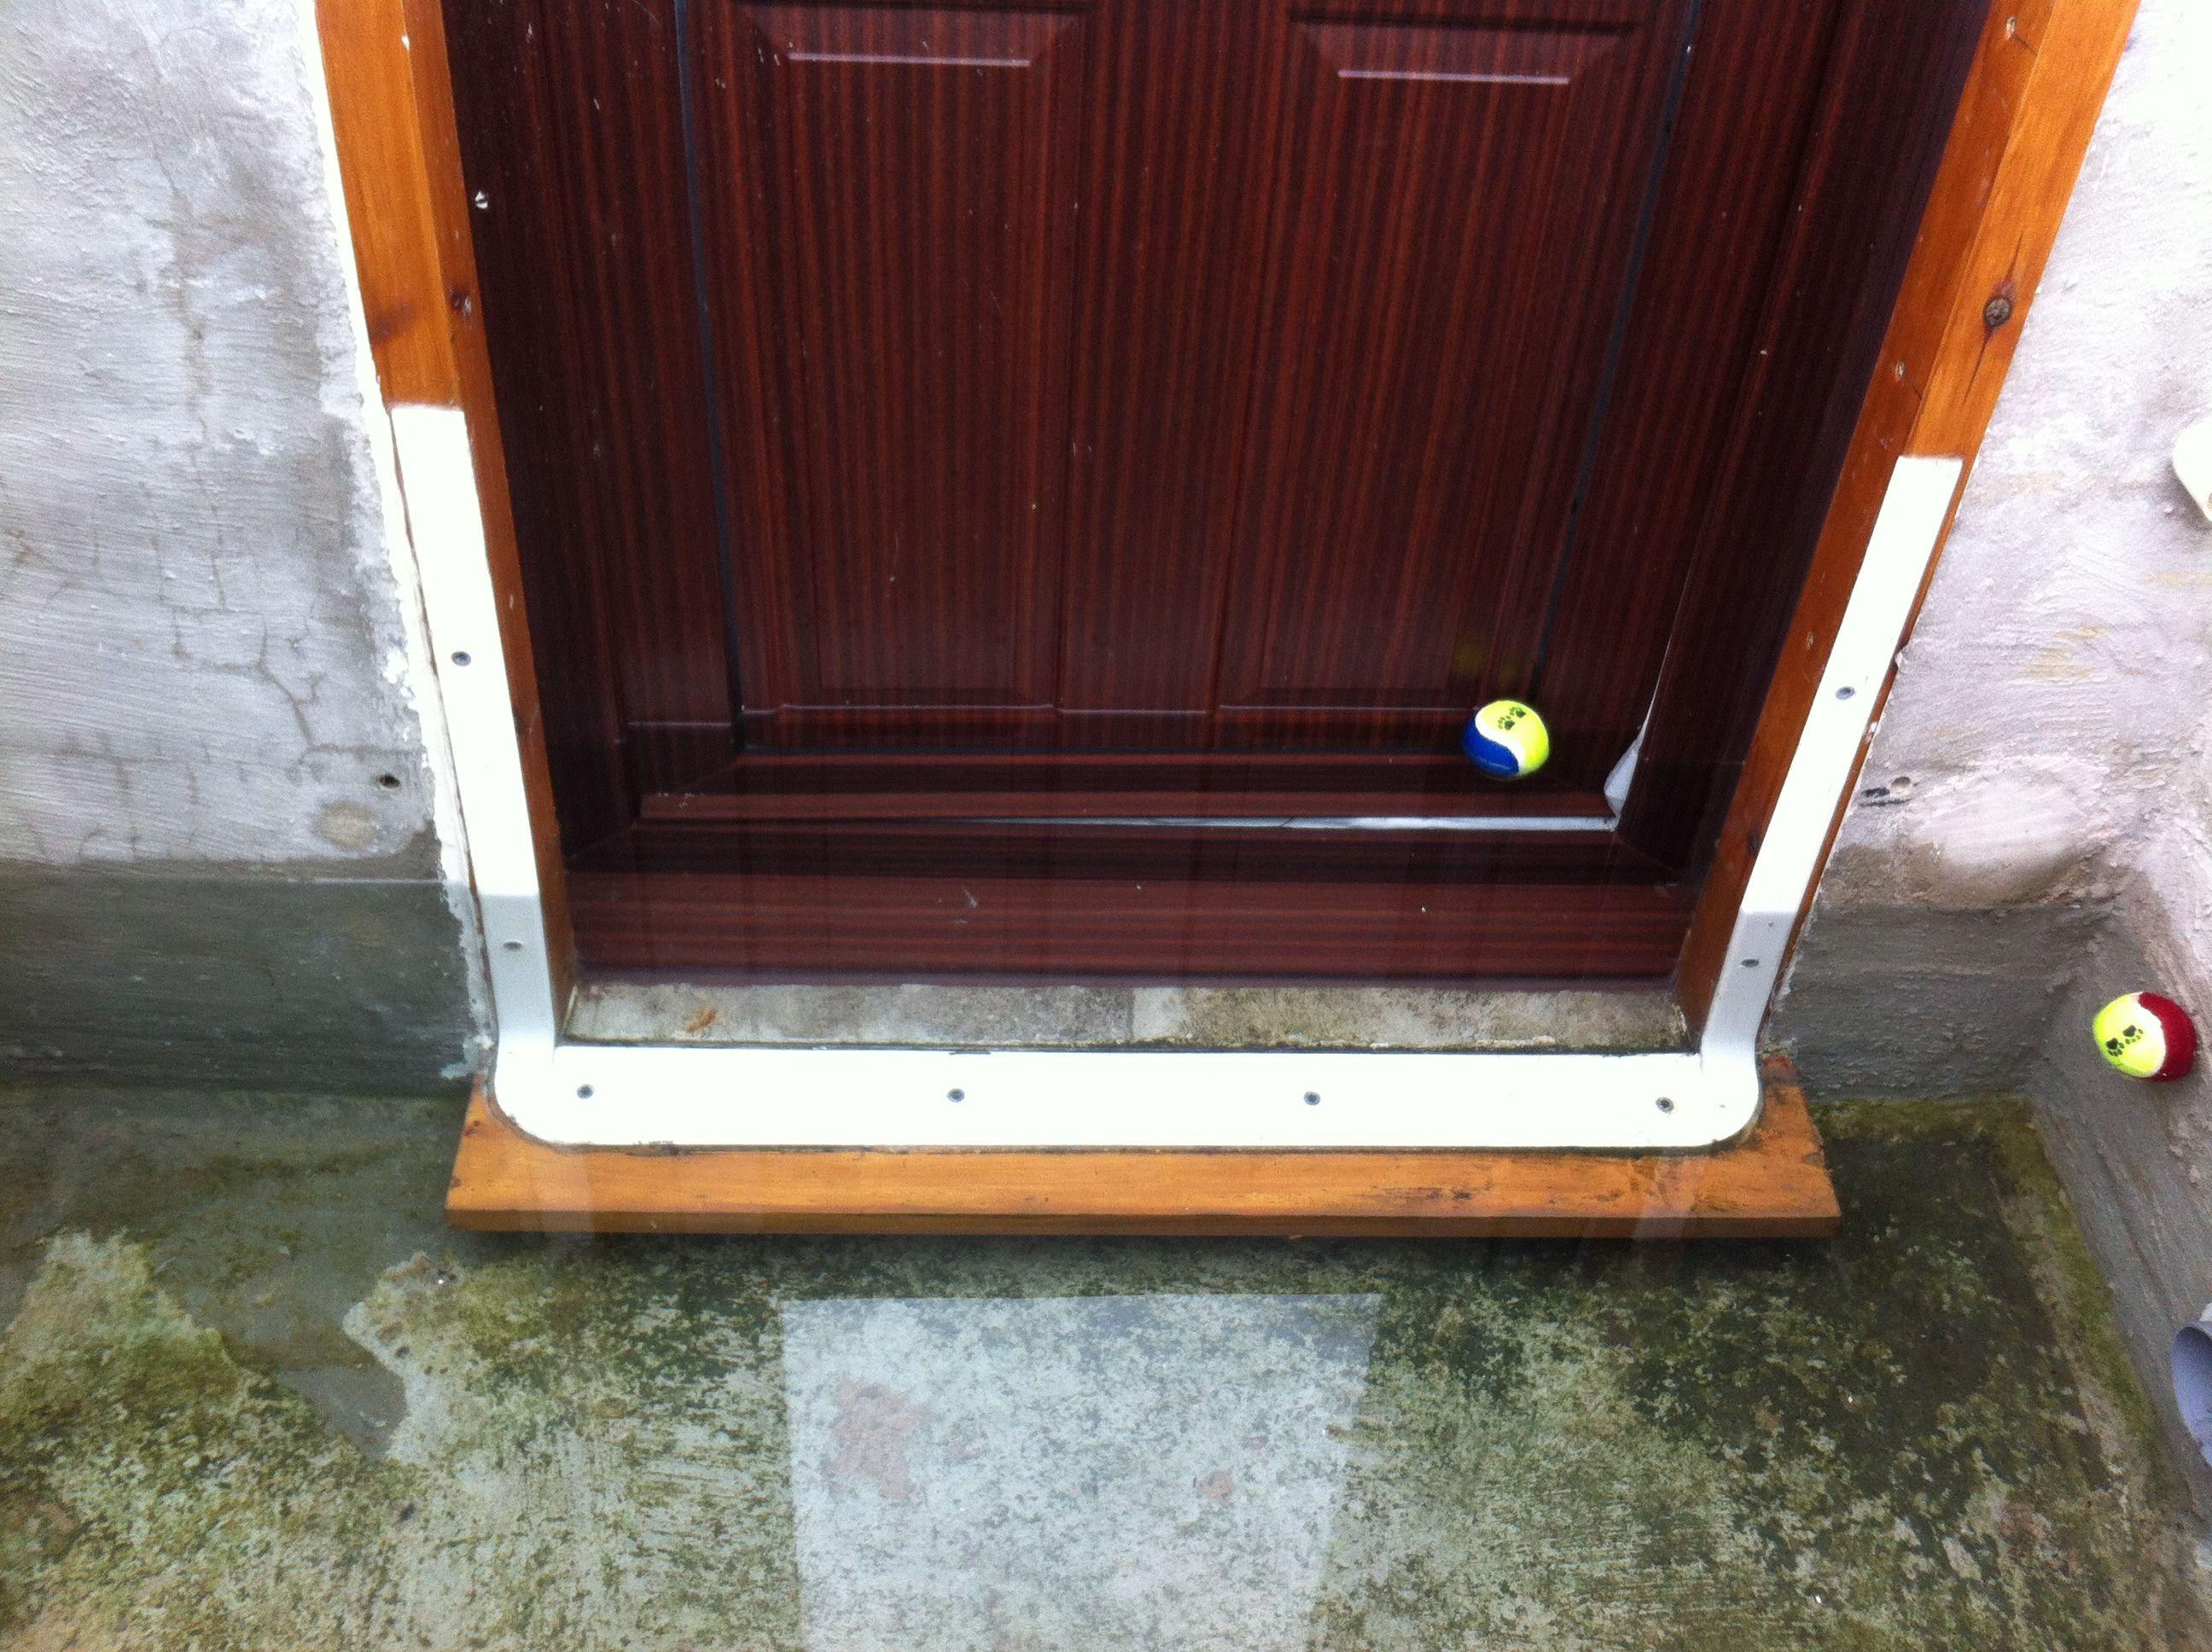 32 Tutorial Unique Diy Home Flood Protection Barriers In 2020 Diy Window Bedside Table Diy Reading Diy